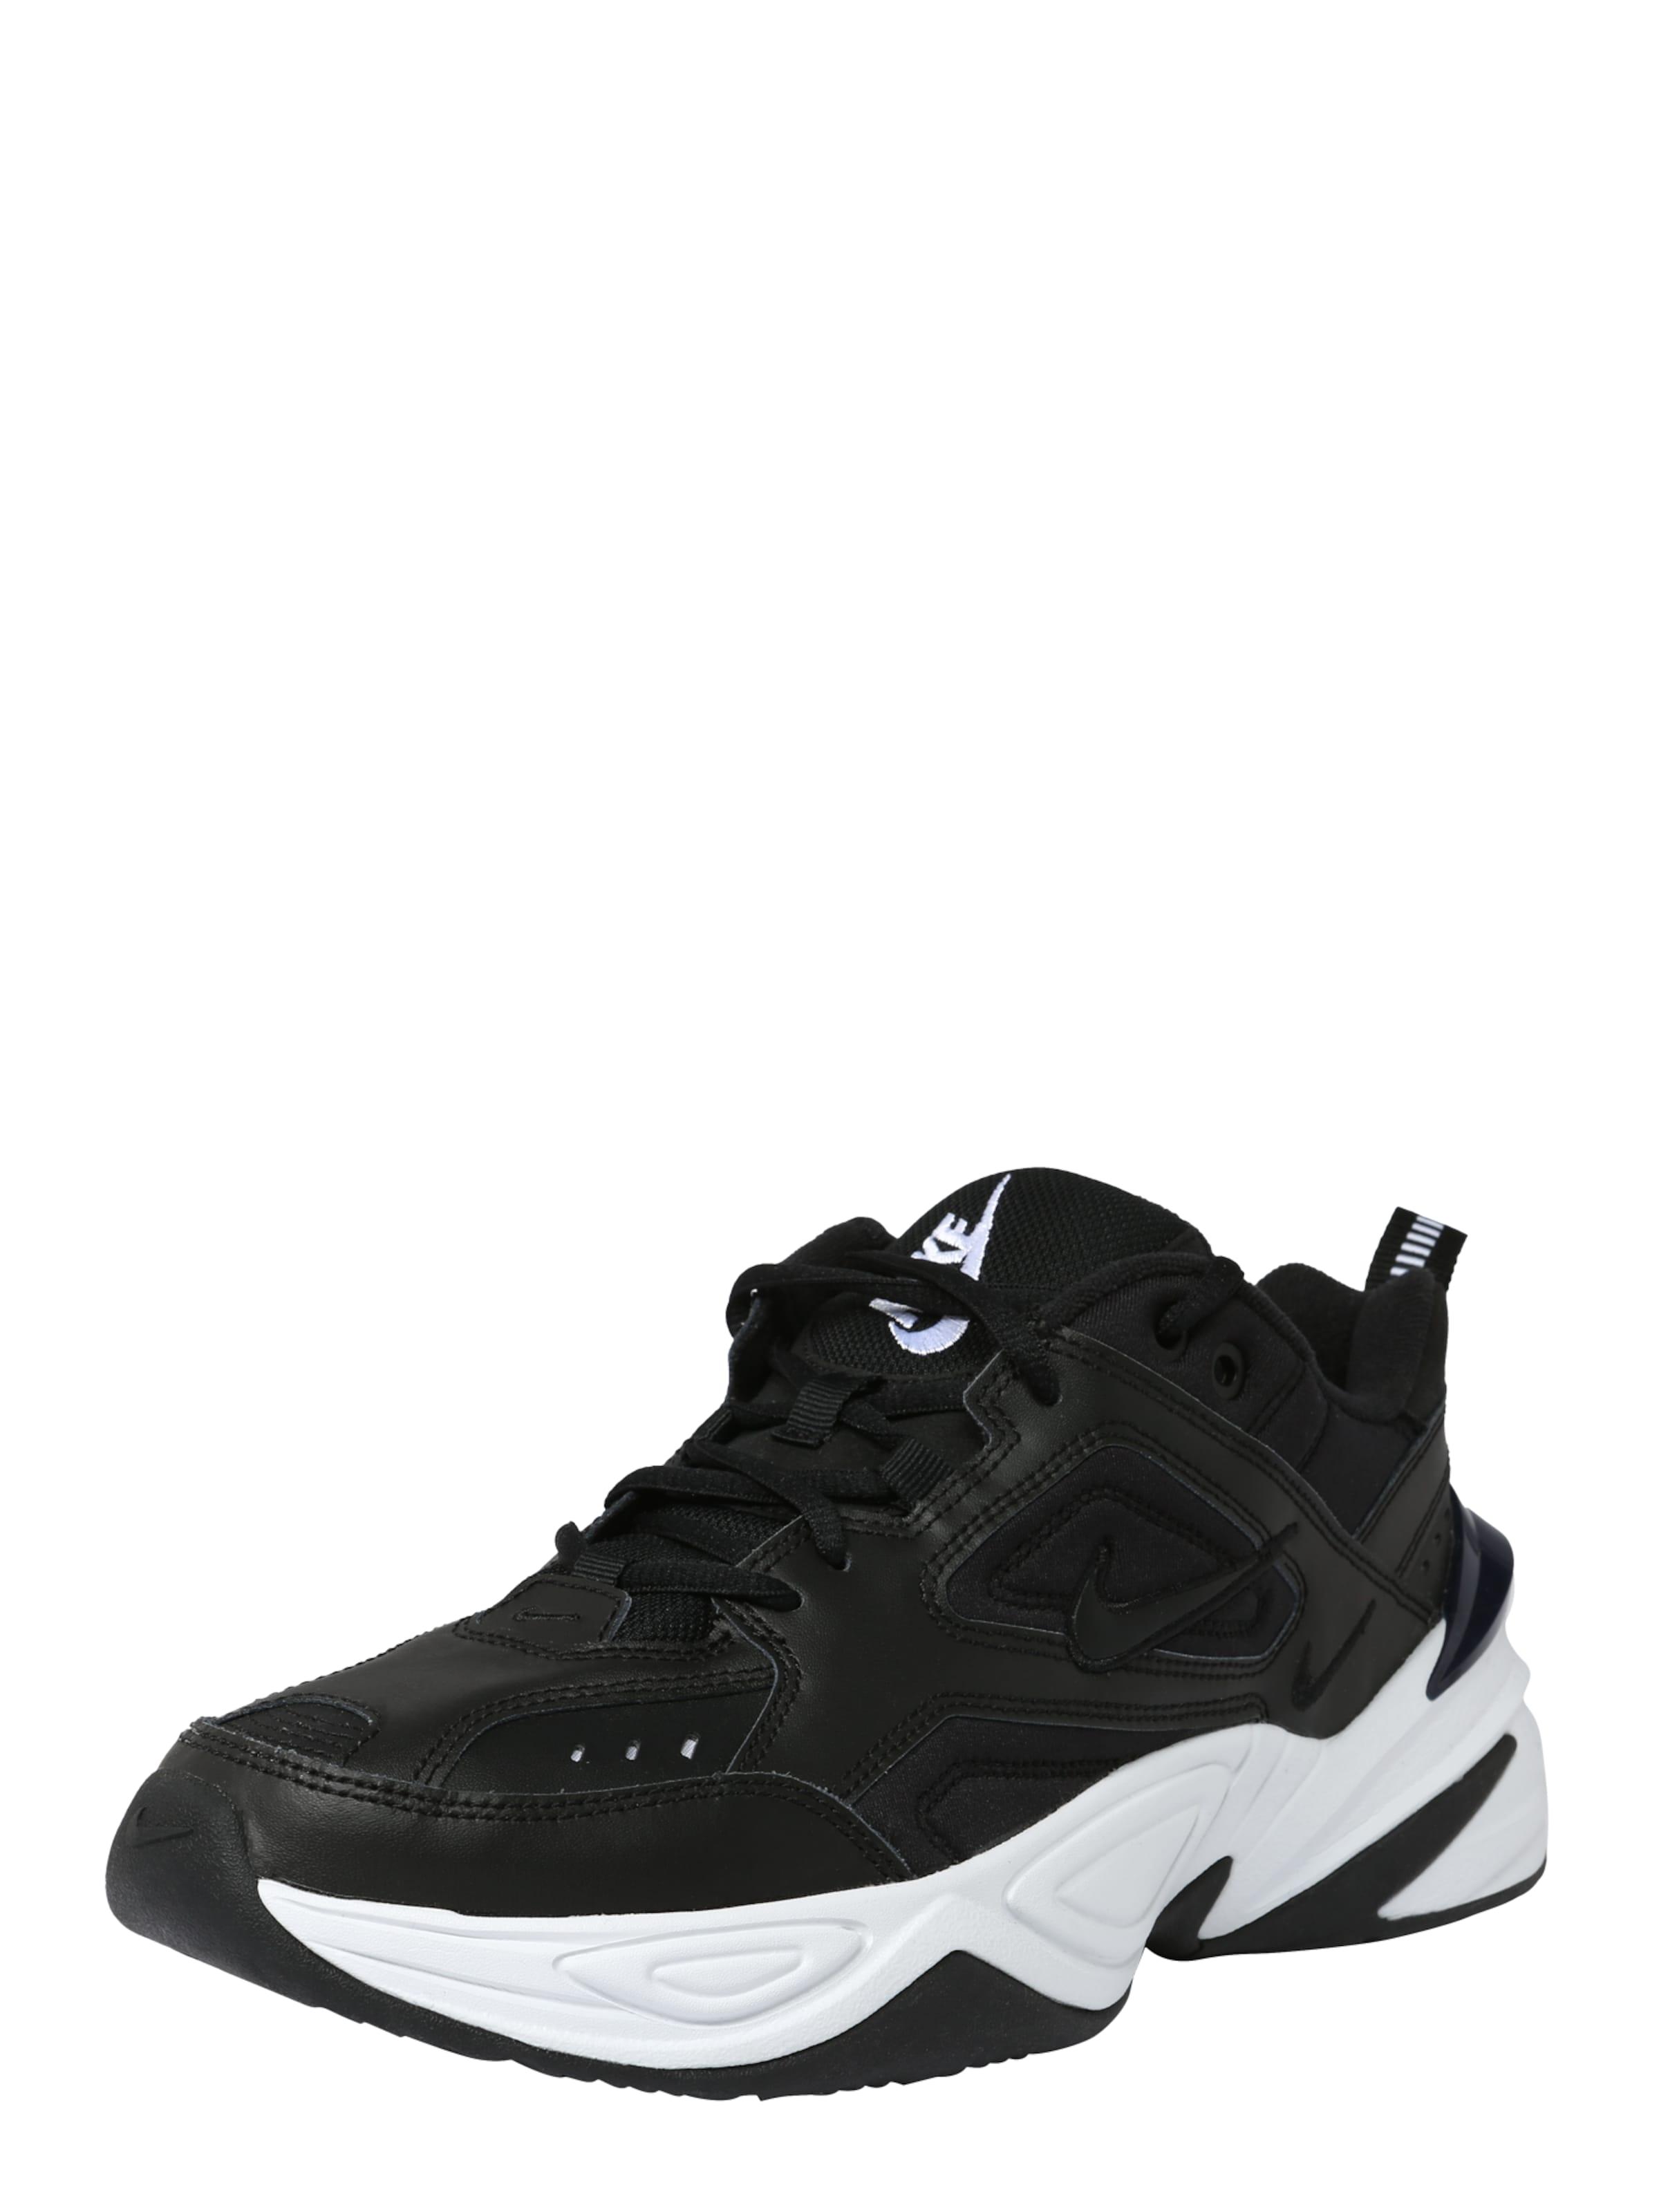 Sneaker Weiß Nike In Sportswear 'm2k Tekno' tsQhxrdC